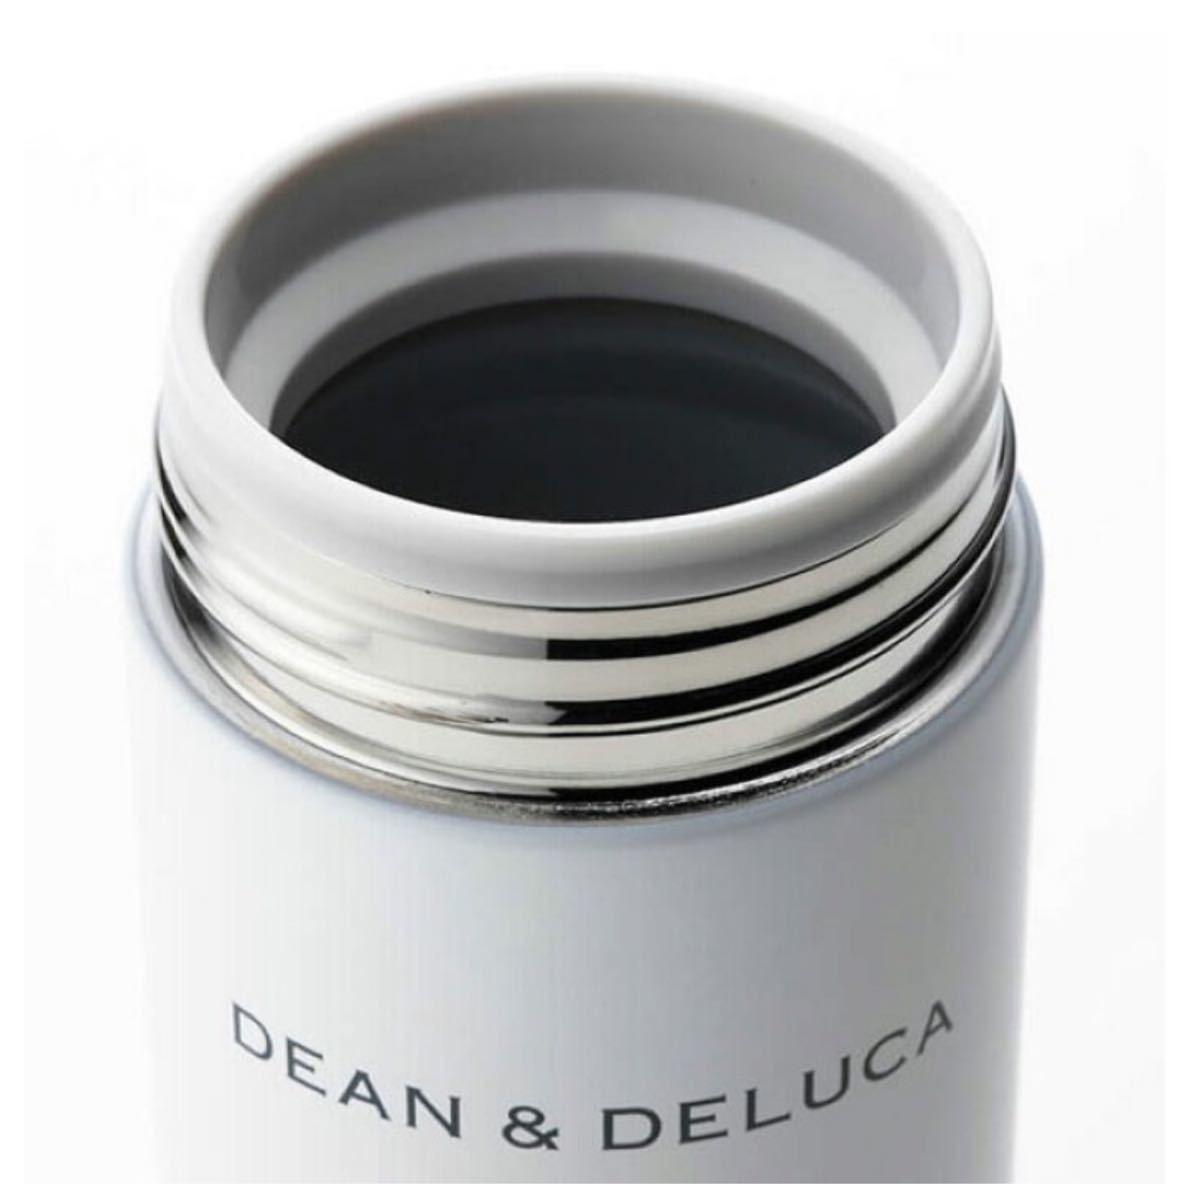 DEAN&DELUCA スープジャー2個セット